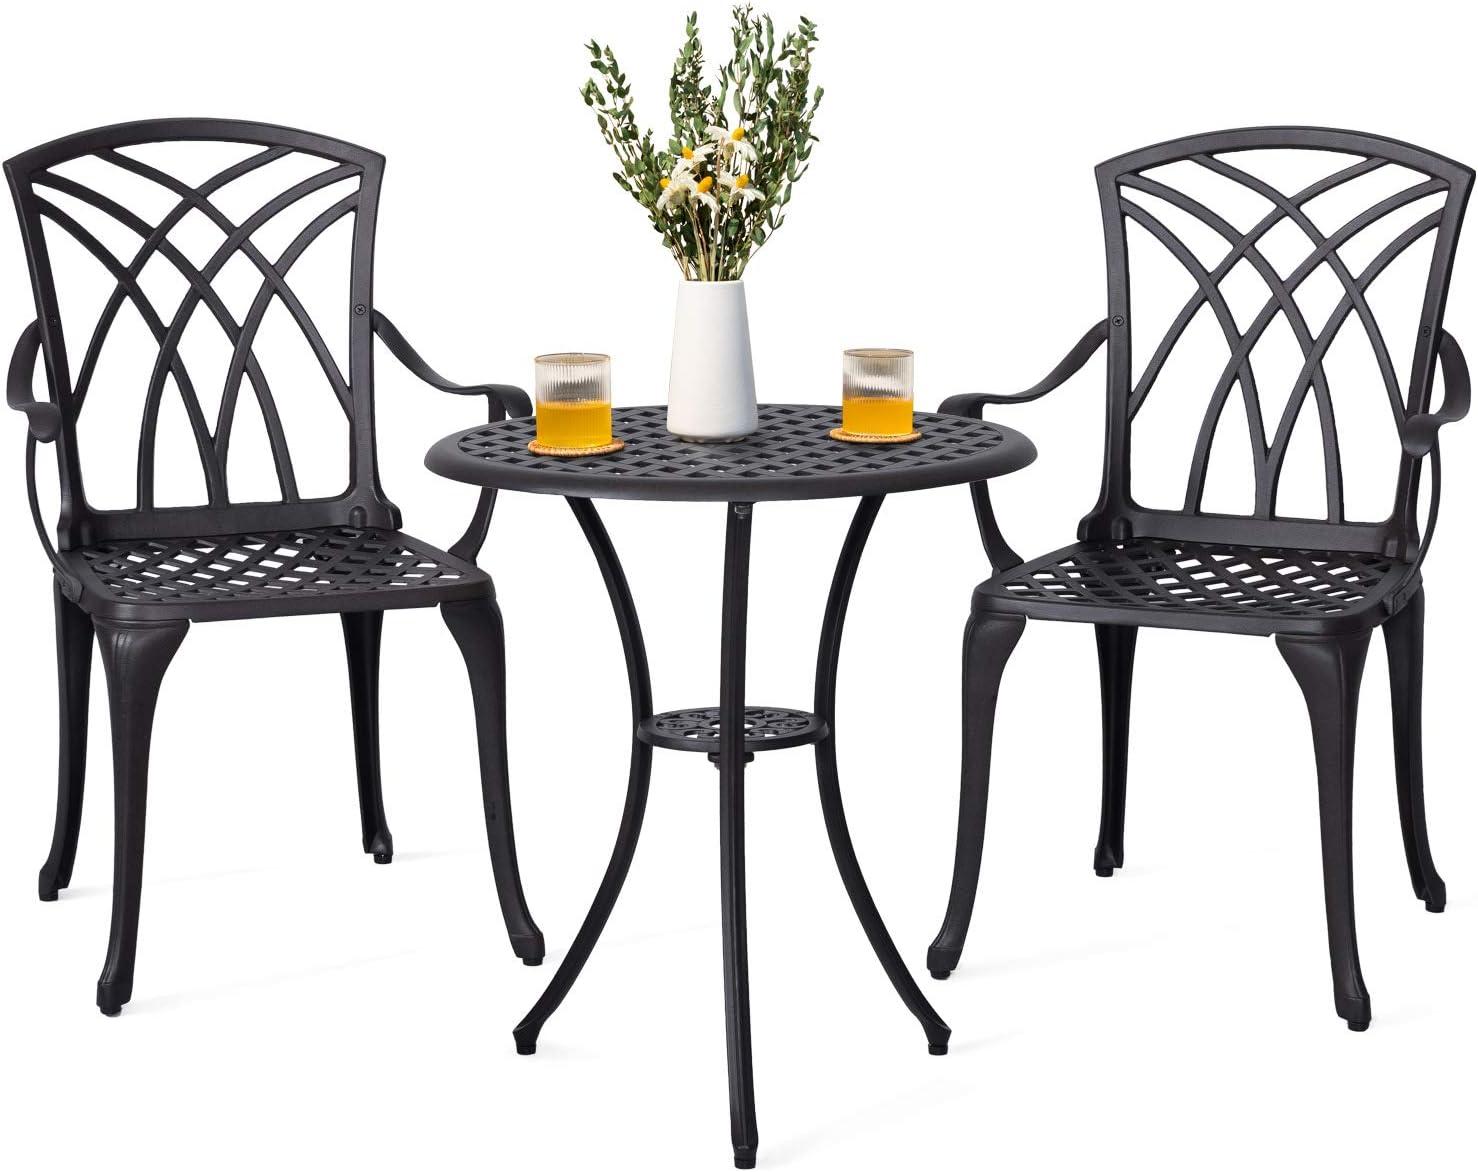 Nuu Garden 5 Piece Outdoor Bistro Set, Bistro Table Set with Umbrella Hole  for Patio – Cast Aluminum, Antique Bronze